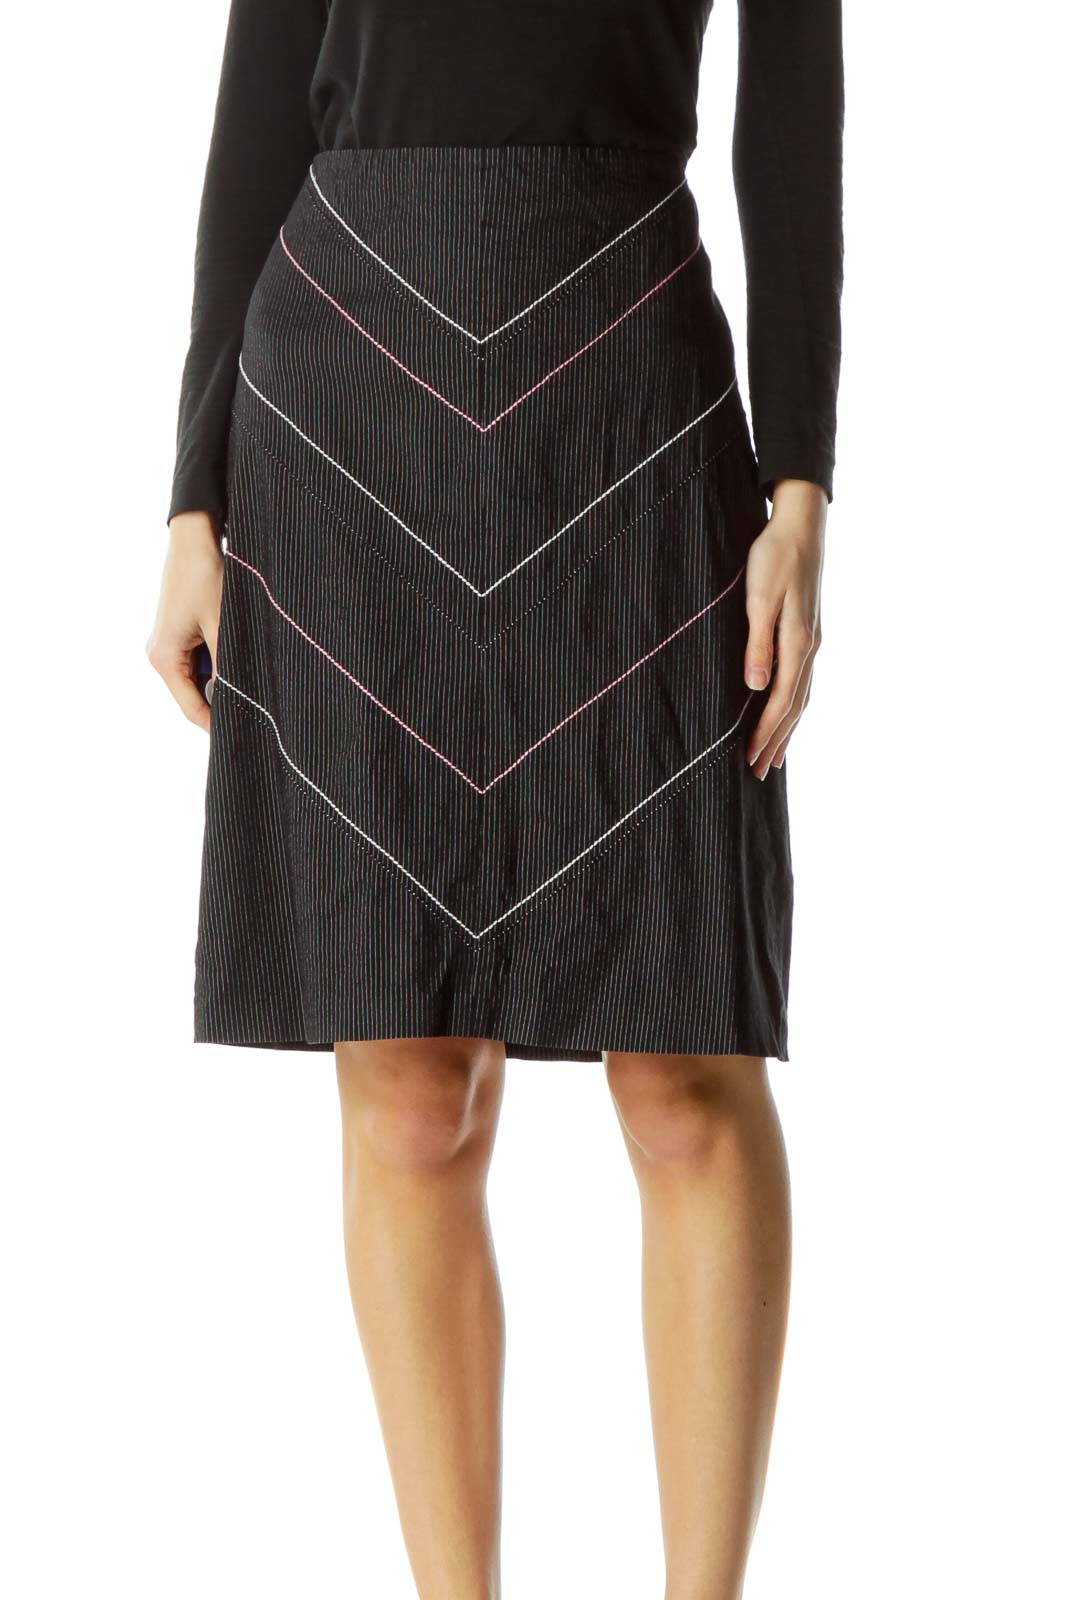 Black White Pinstripe A-Line Skirt Front